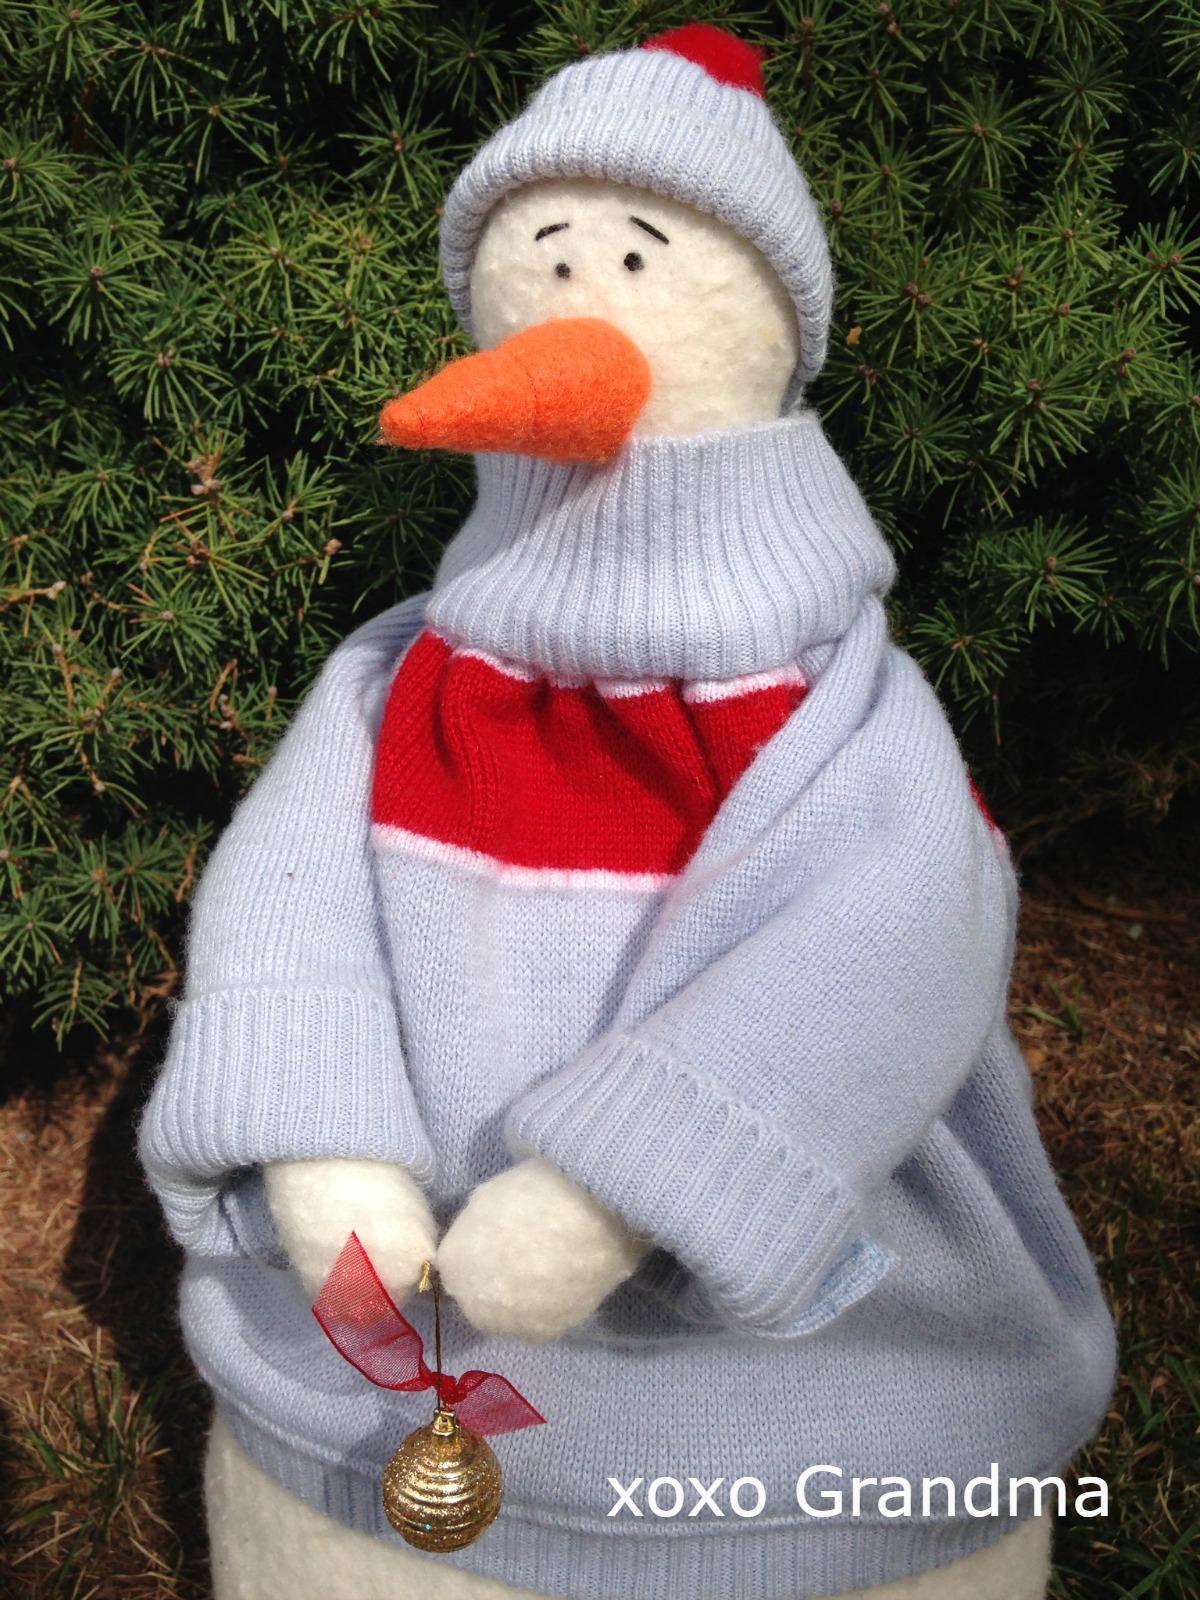 Xoxo Grandma Making Snowmen From Scraps